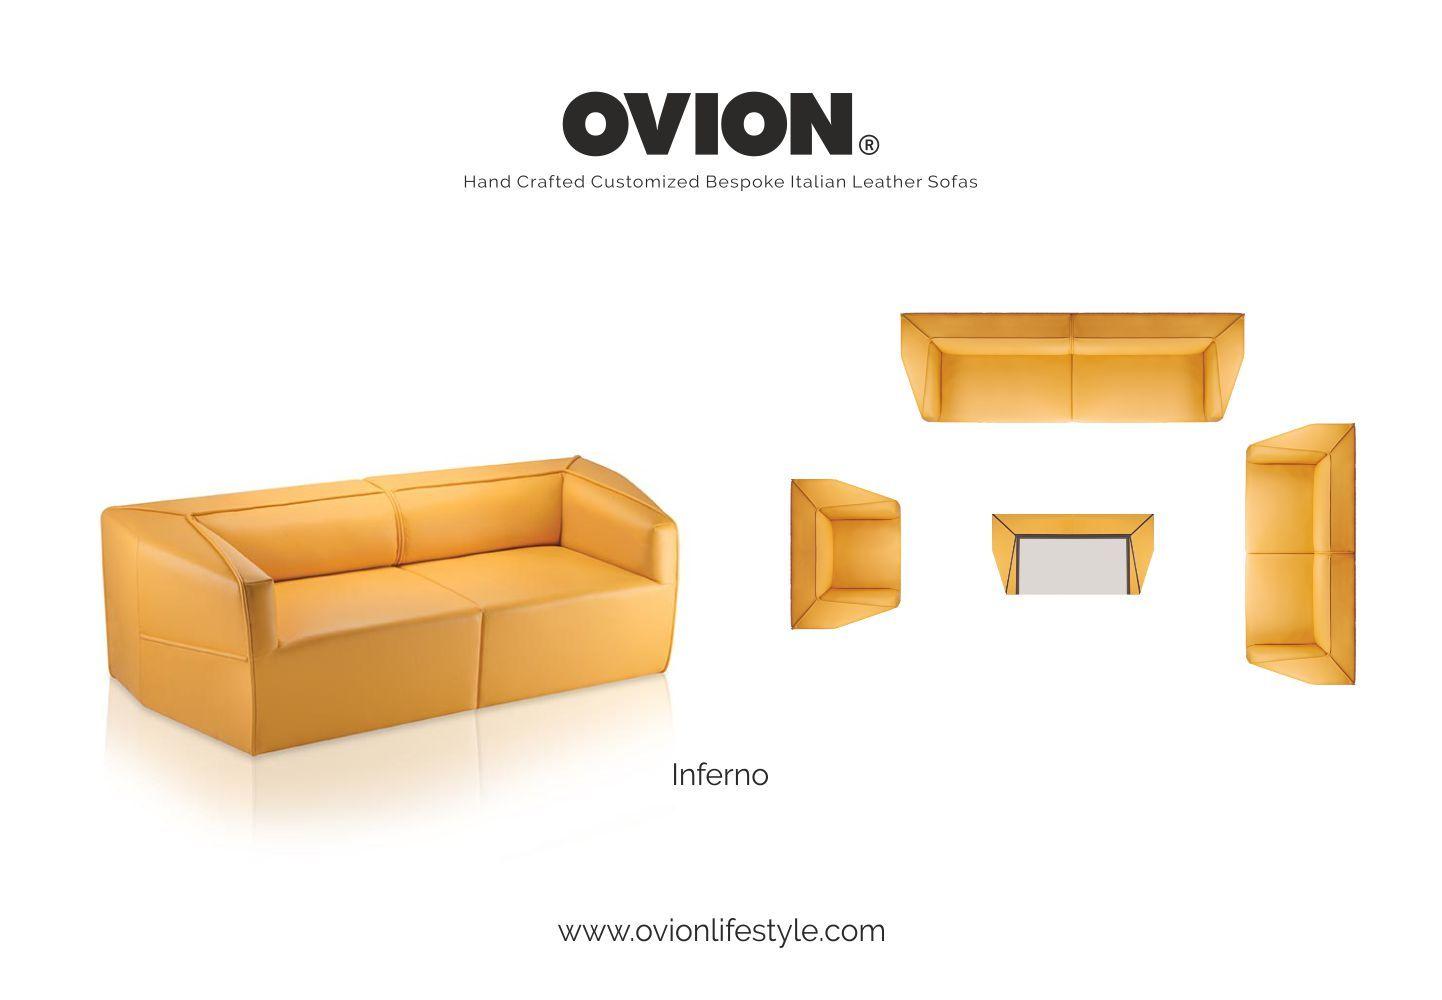 Think Sofas Think Ovion Luxury Italian Leather Sofa Leather Sofa Furniture Italian Leather Sofa Leather Sofa